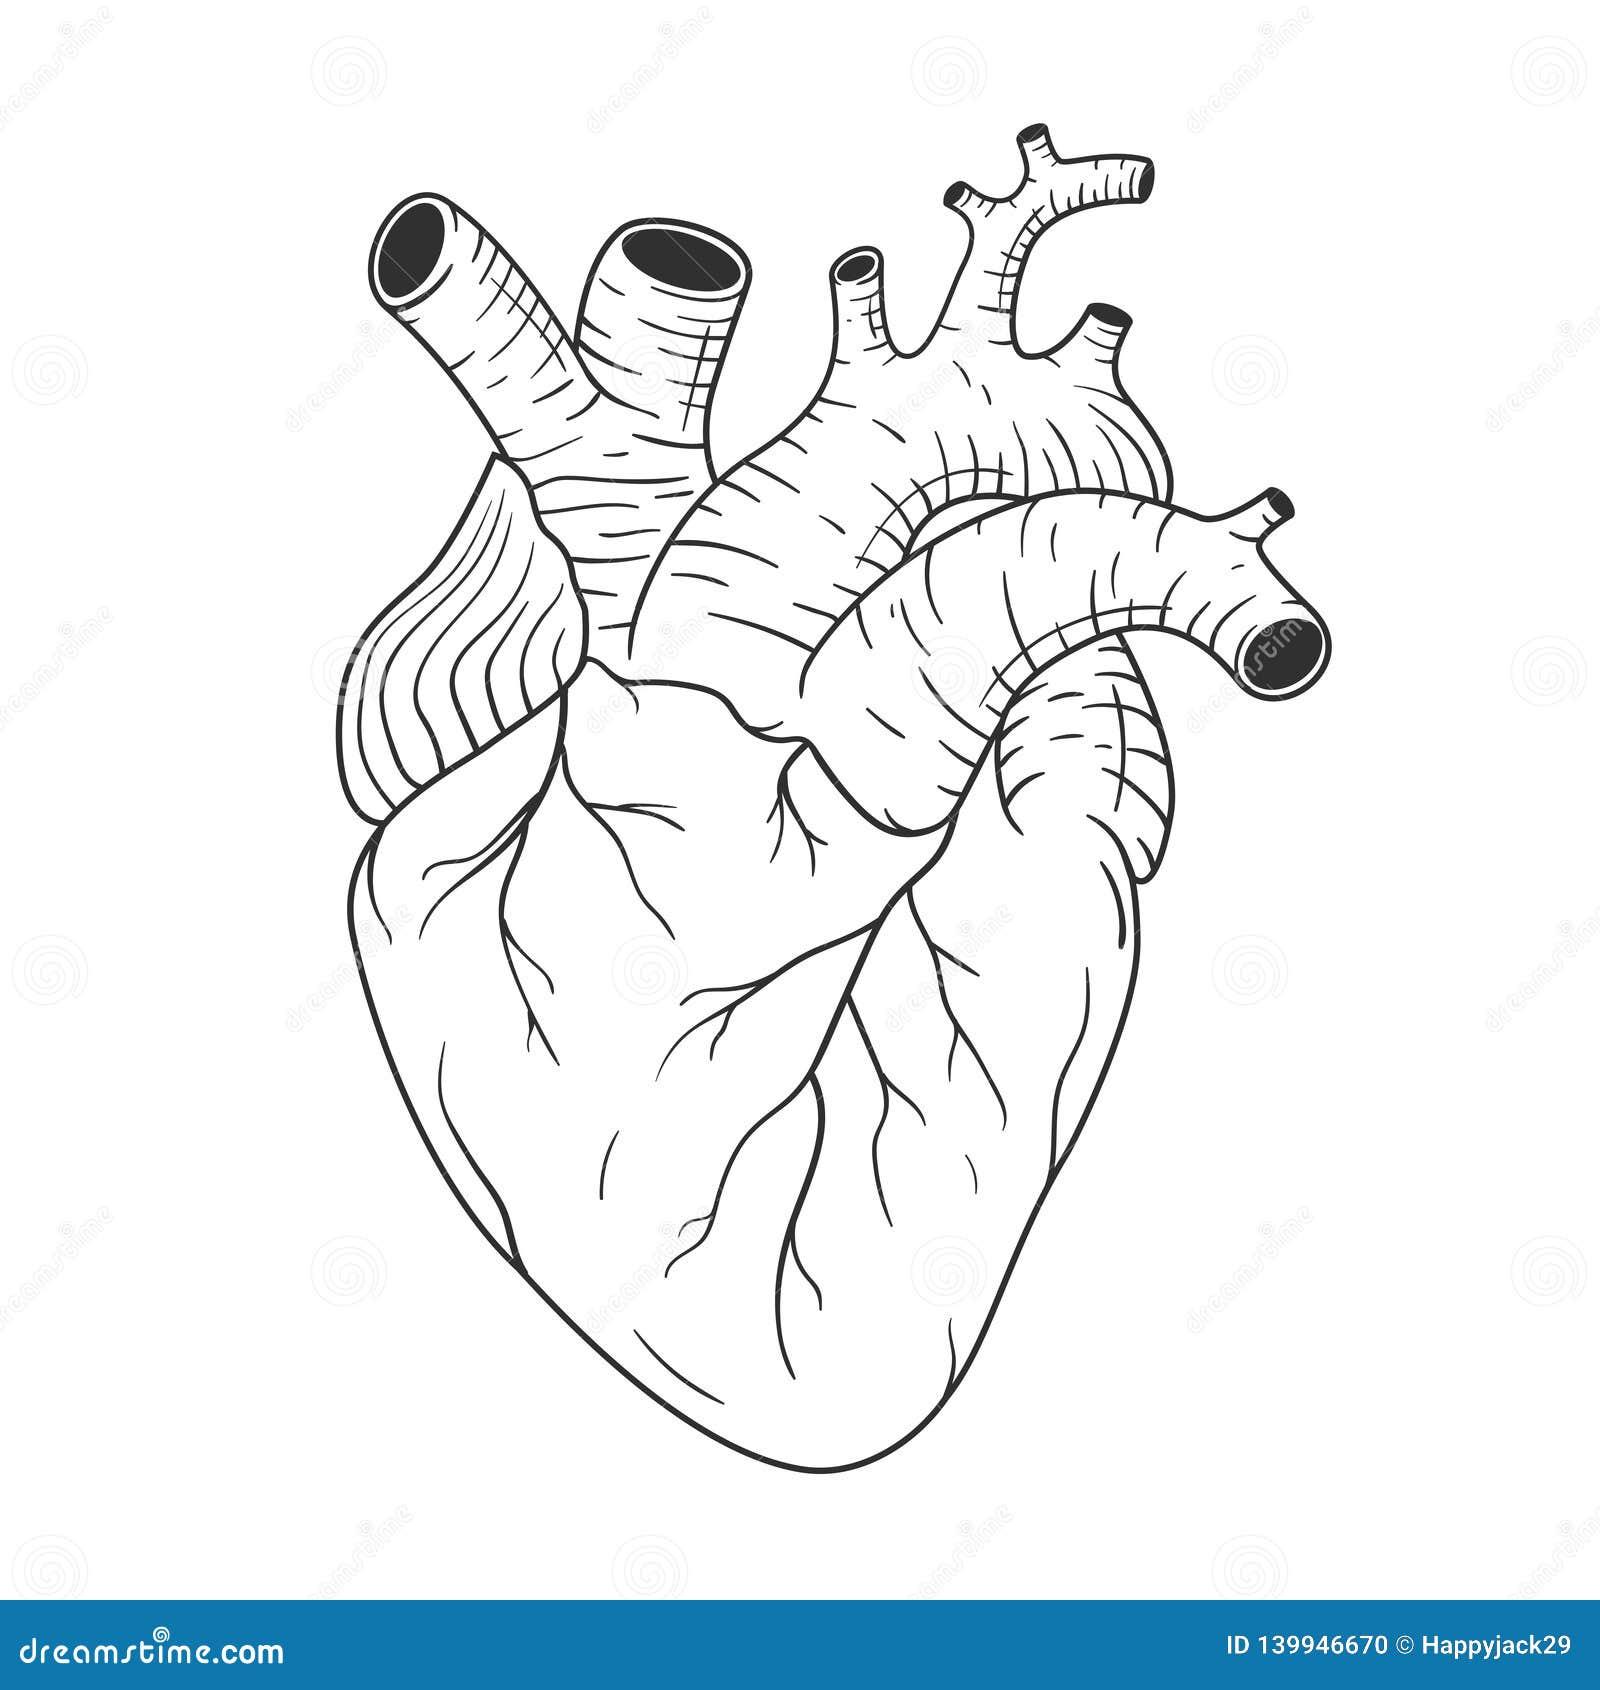 Human Heart Black White Stock Illustrations 10 932 Human Heart Black White Stock Illustrations Vectors Clipart Dreamstime